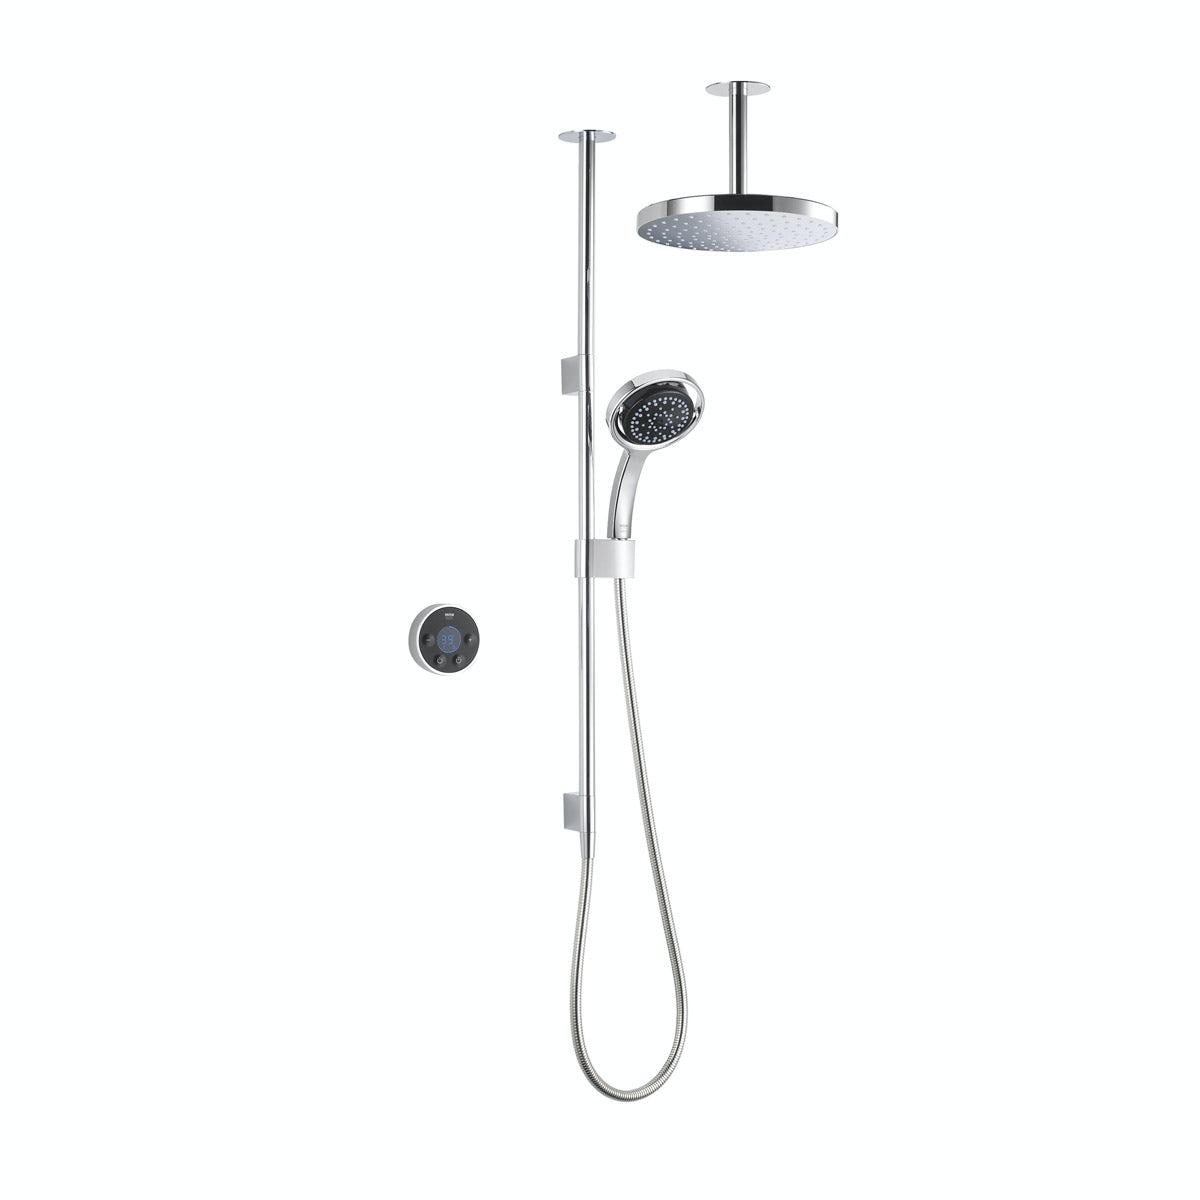 Mira Platinum dual ceiling fed digital shower standard